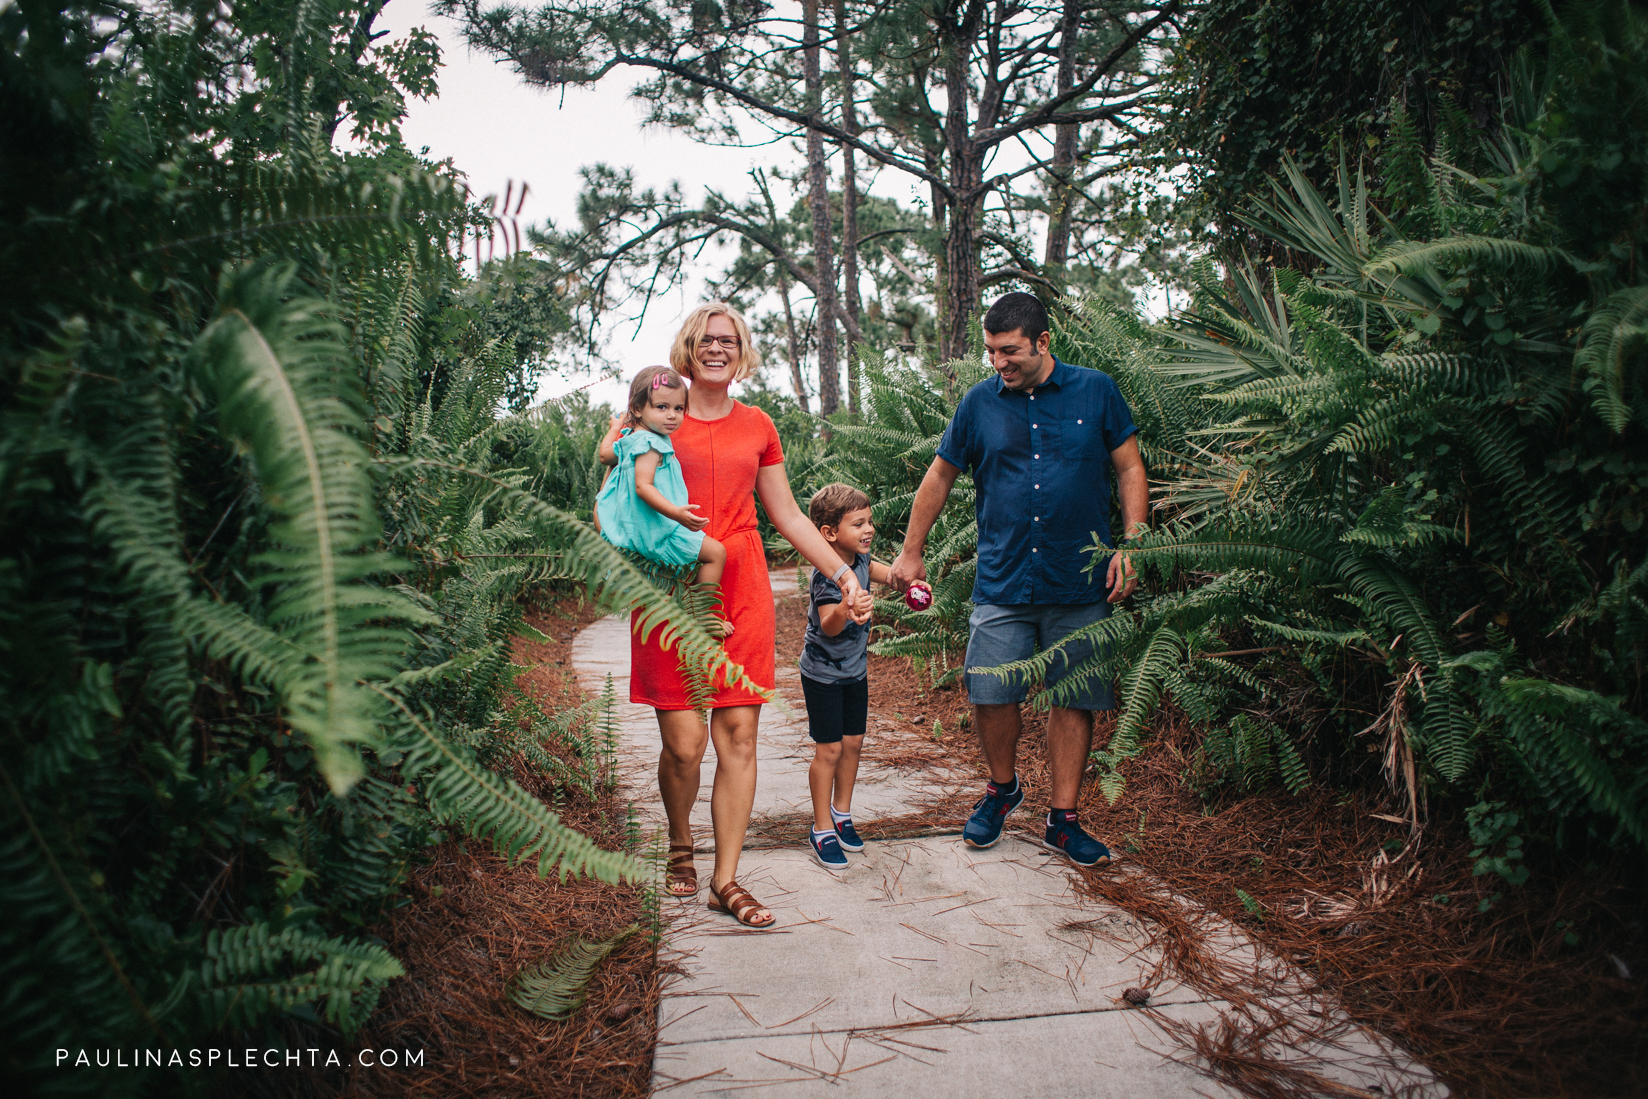 splechta-child-photographer-family-photographer-palm-beach.jpg